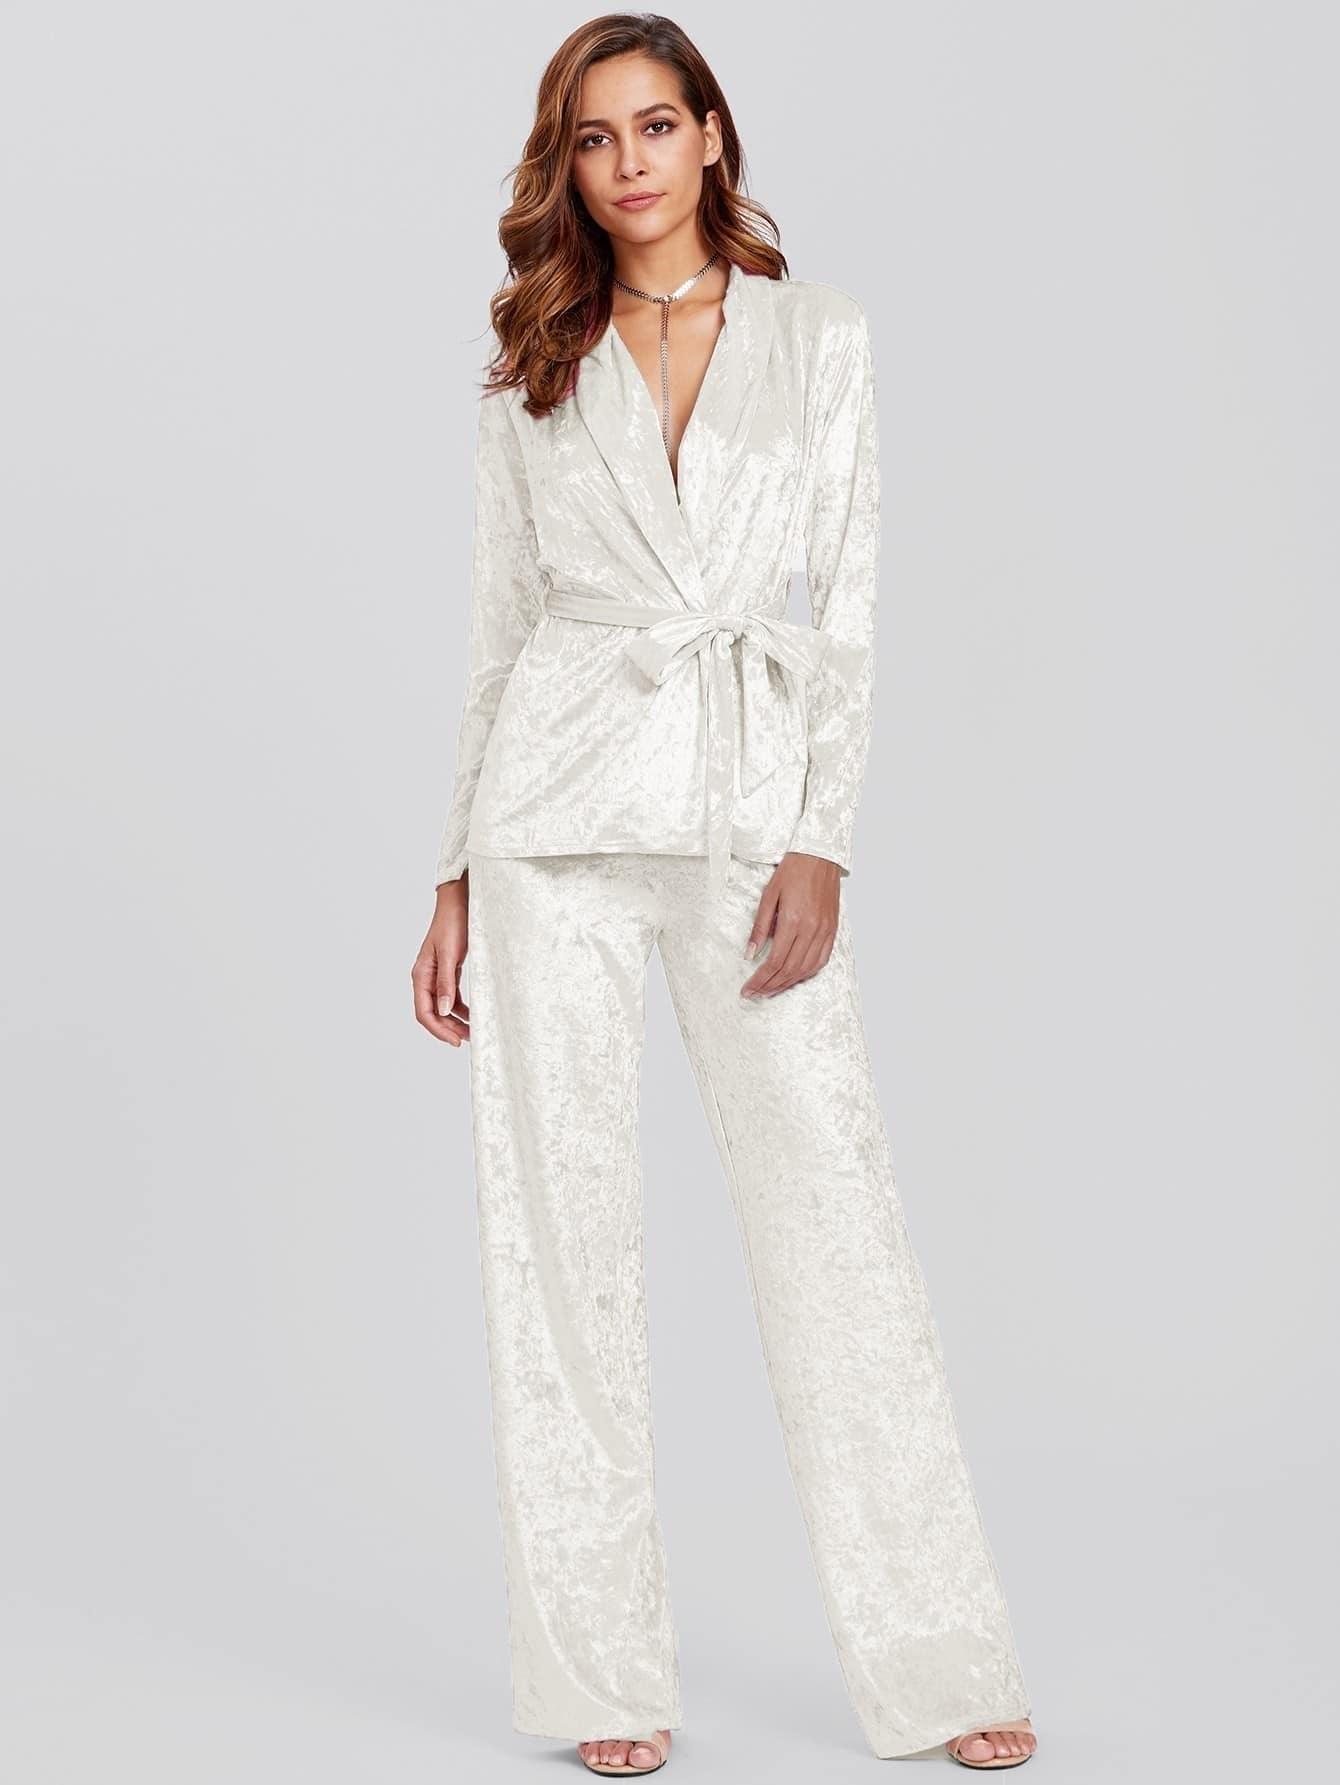 Crushed Velvet Wrap Top & Pants Pajama Set crushed velvet top and shorts set